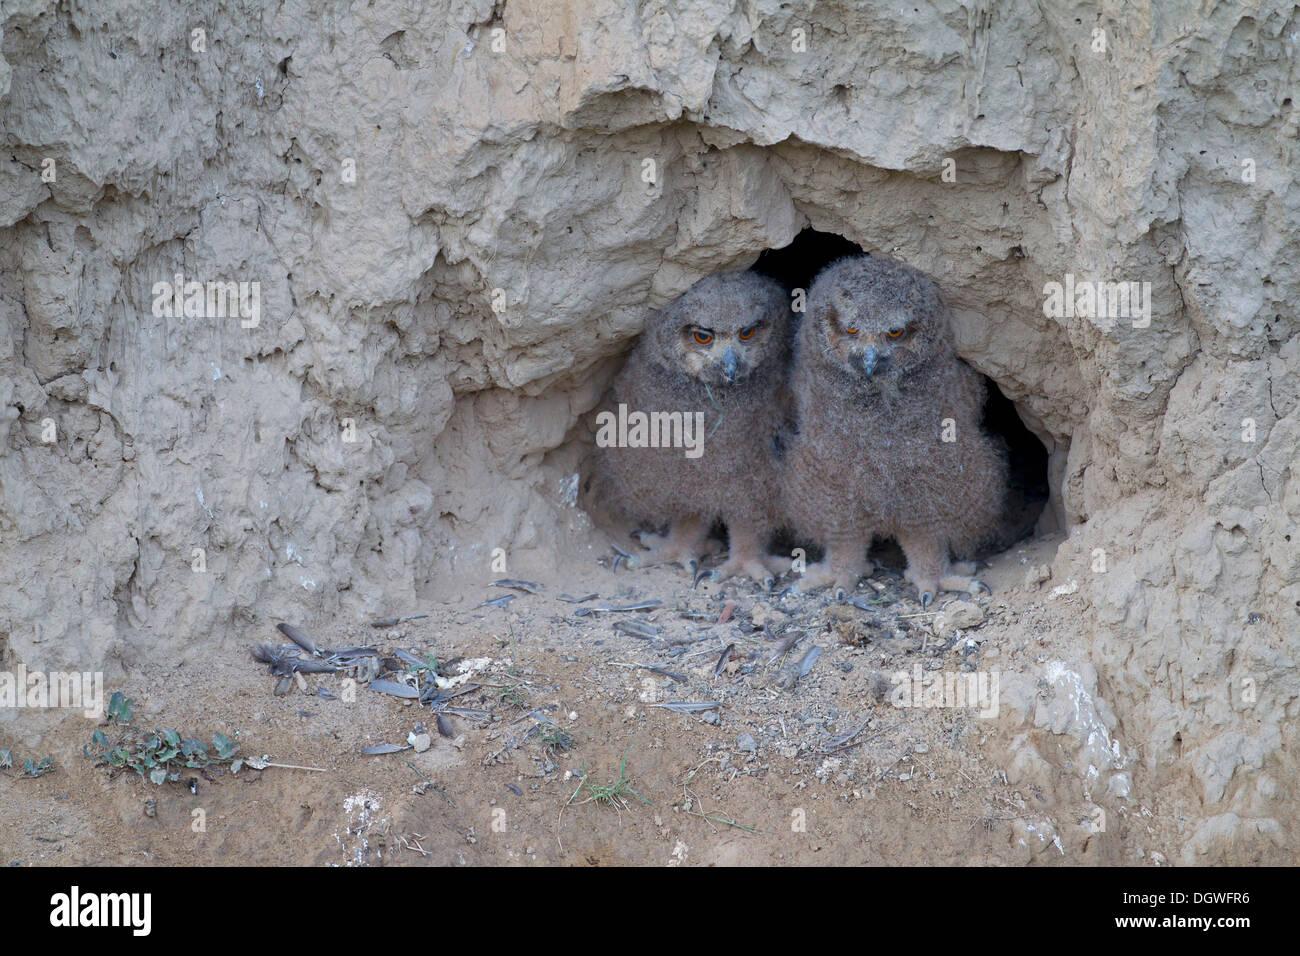 Uhu (Bubo Bubo), Küken in ihren Nährboden in einem Schlamm Wand Nord Bulgarien, Bulgarien Stockbild